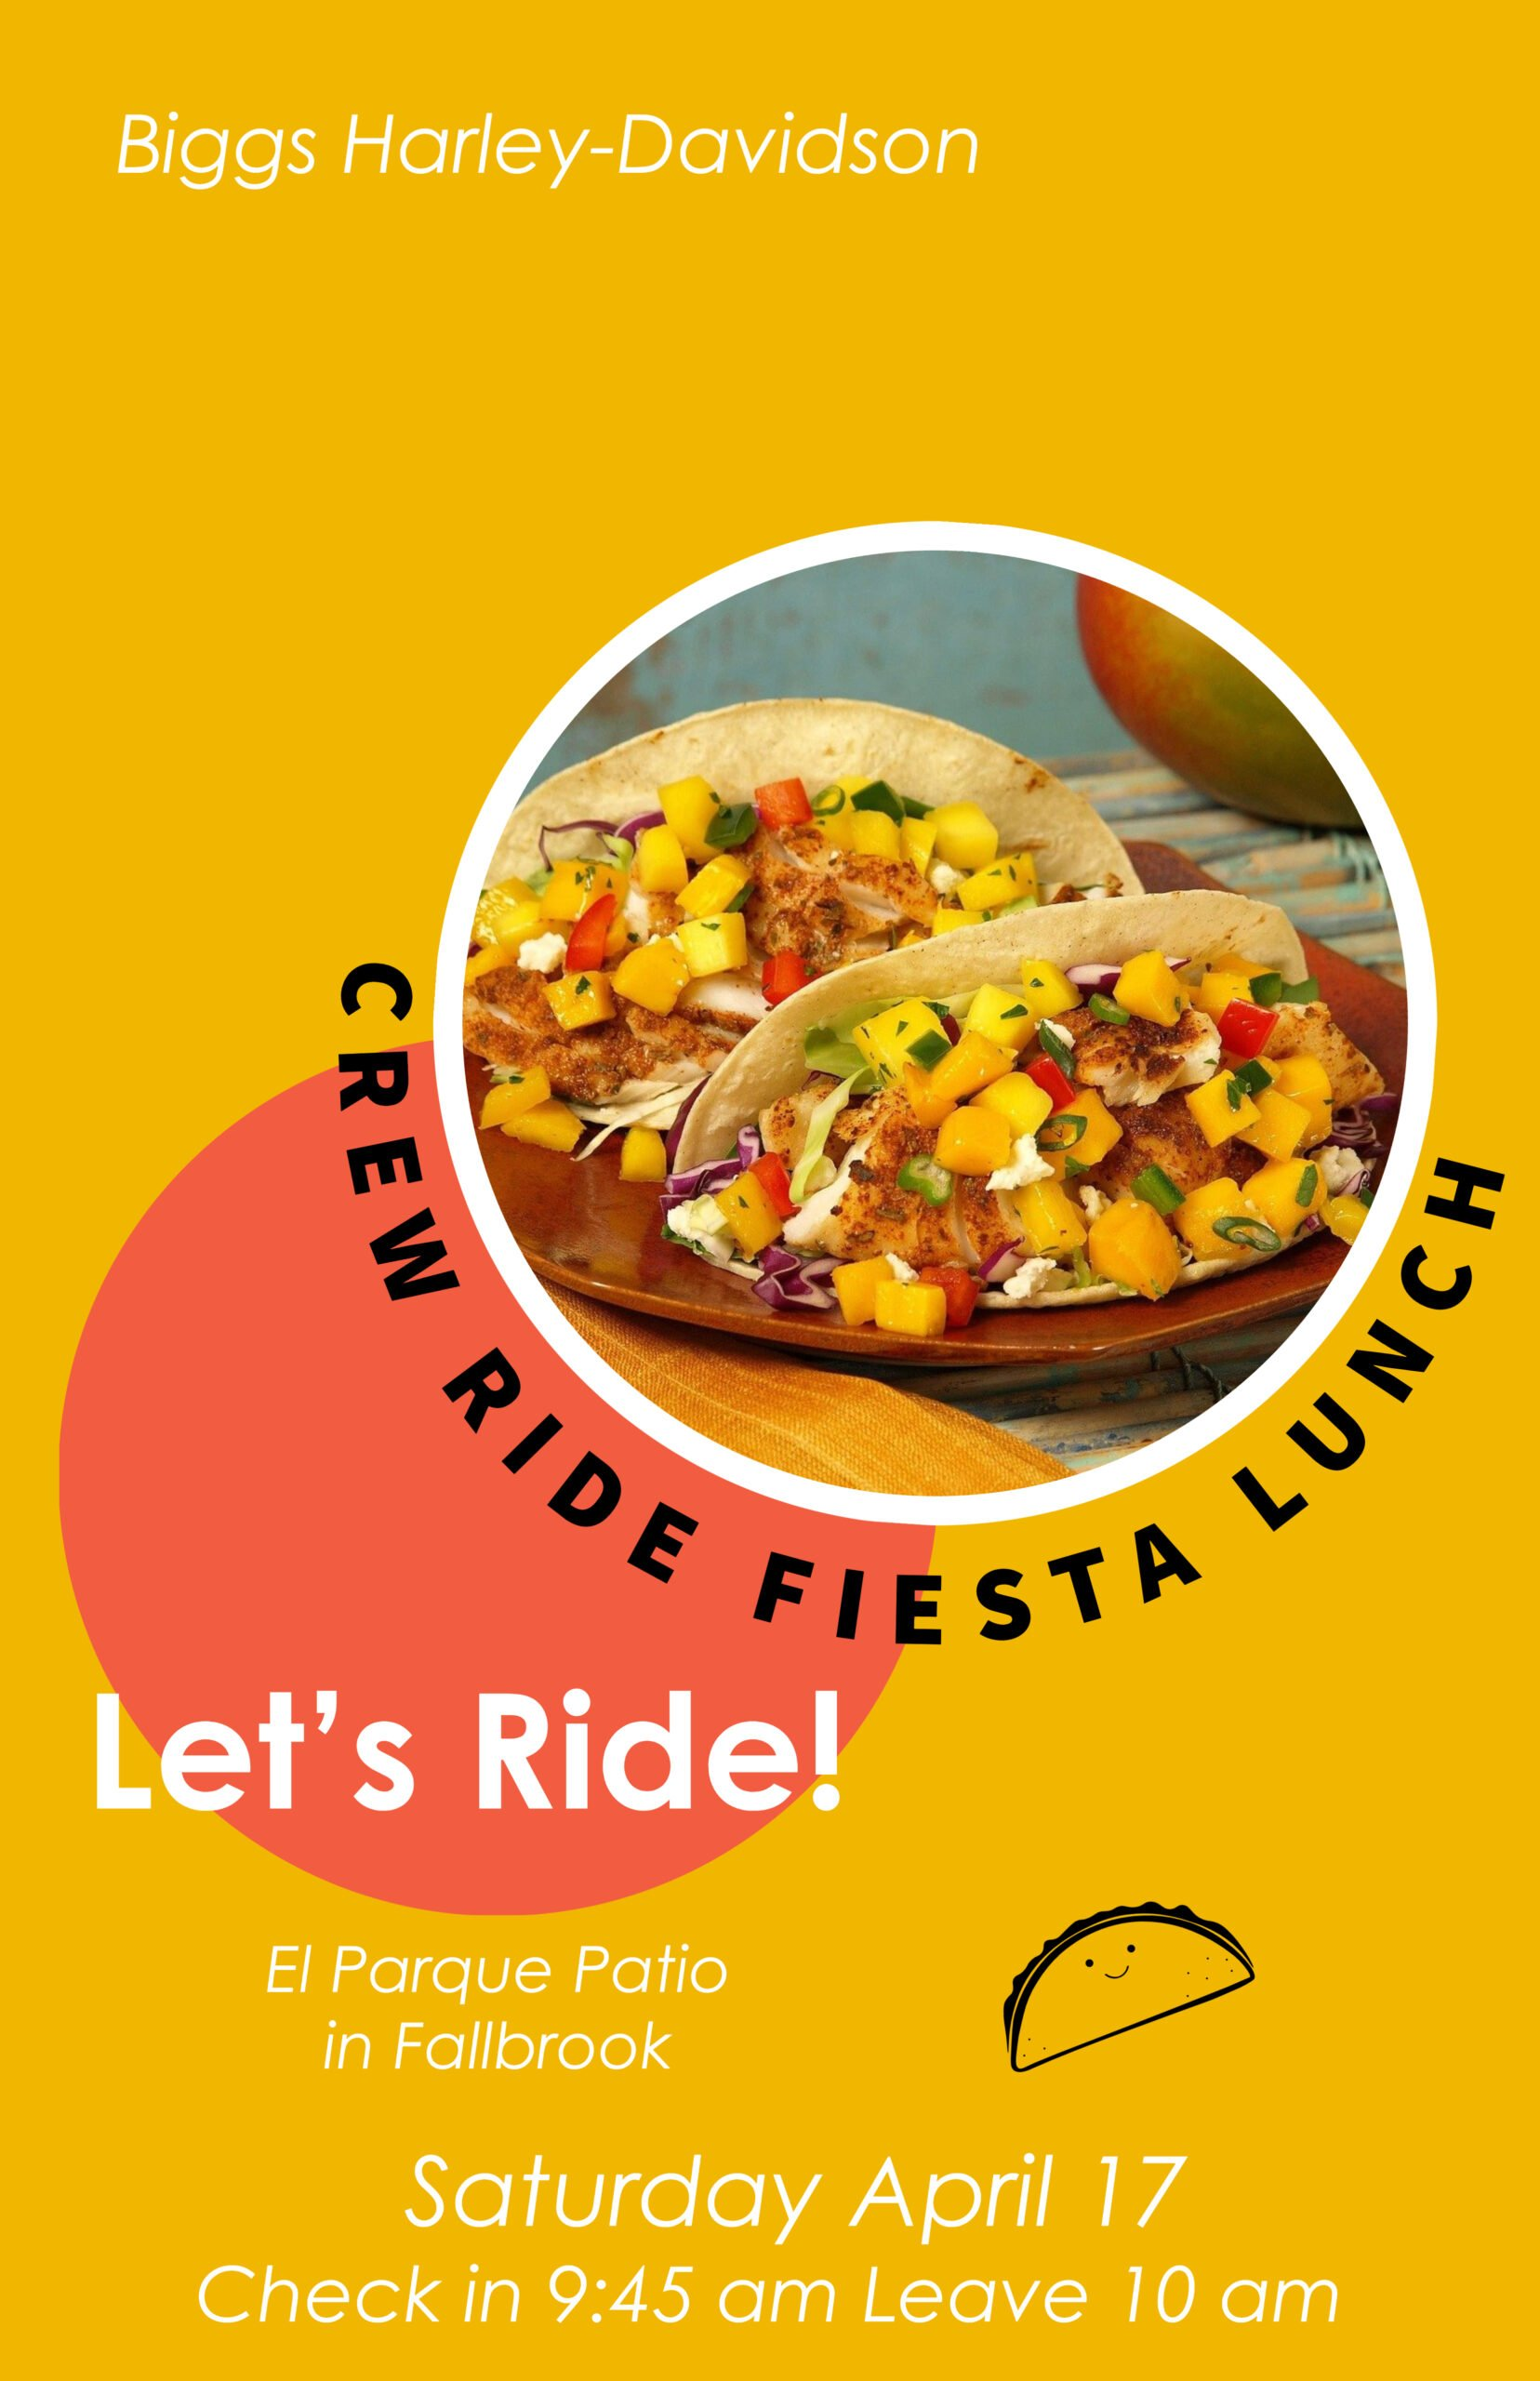 Biggs Crew Ride Fiesta Lunch